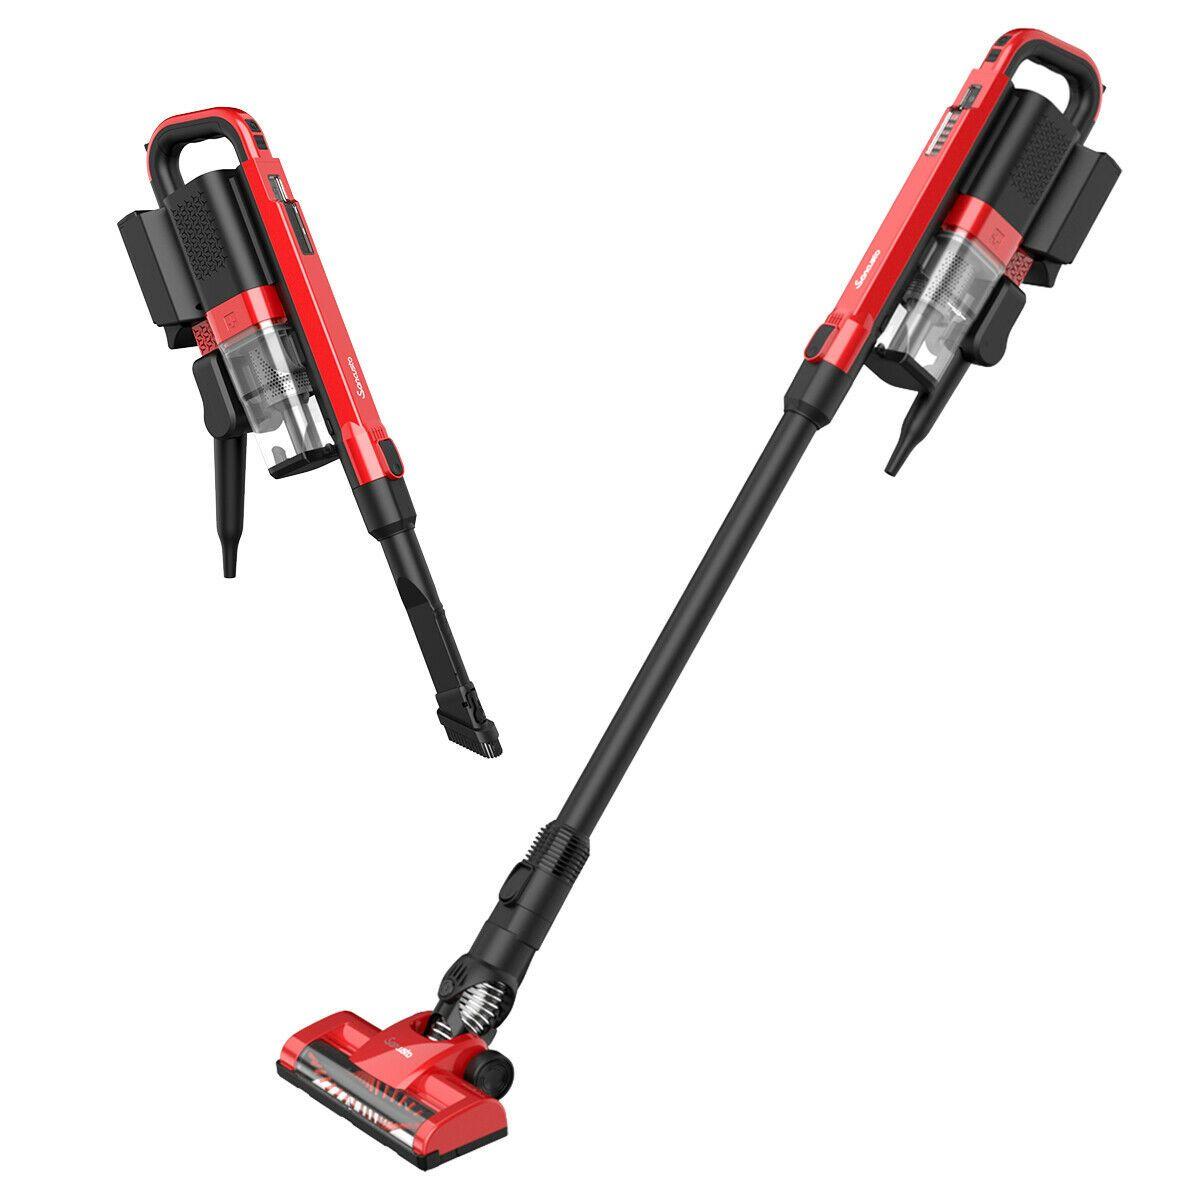 Vacuum Cleaner Cordless Stick Handheld Multi Cyclone Home